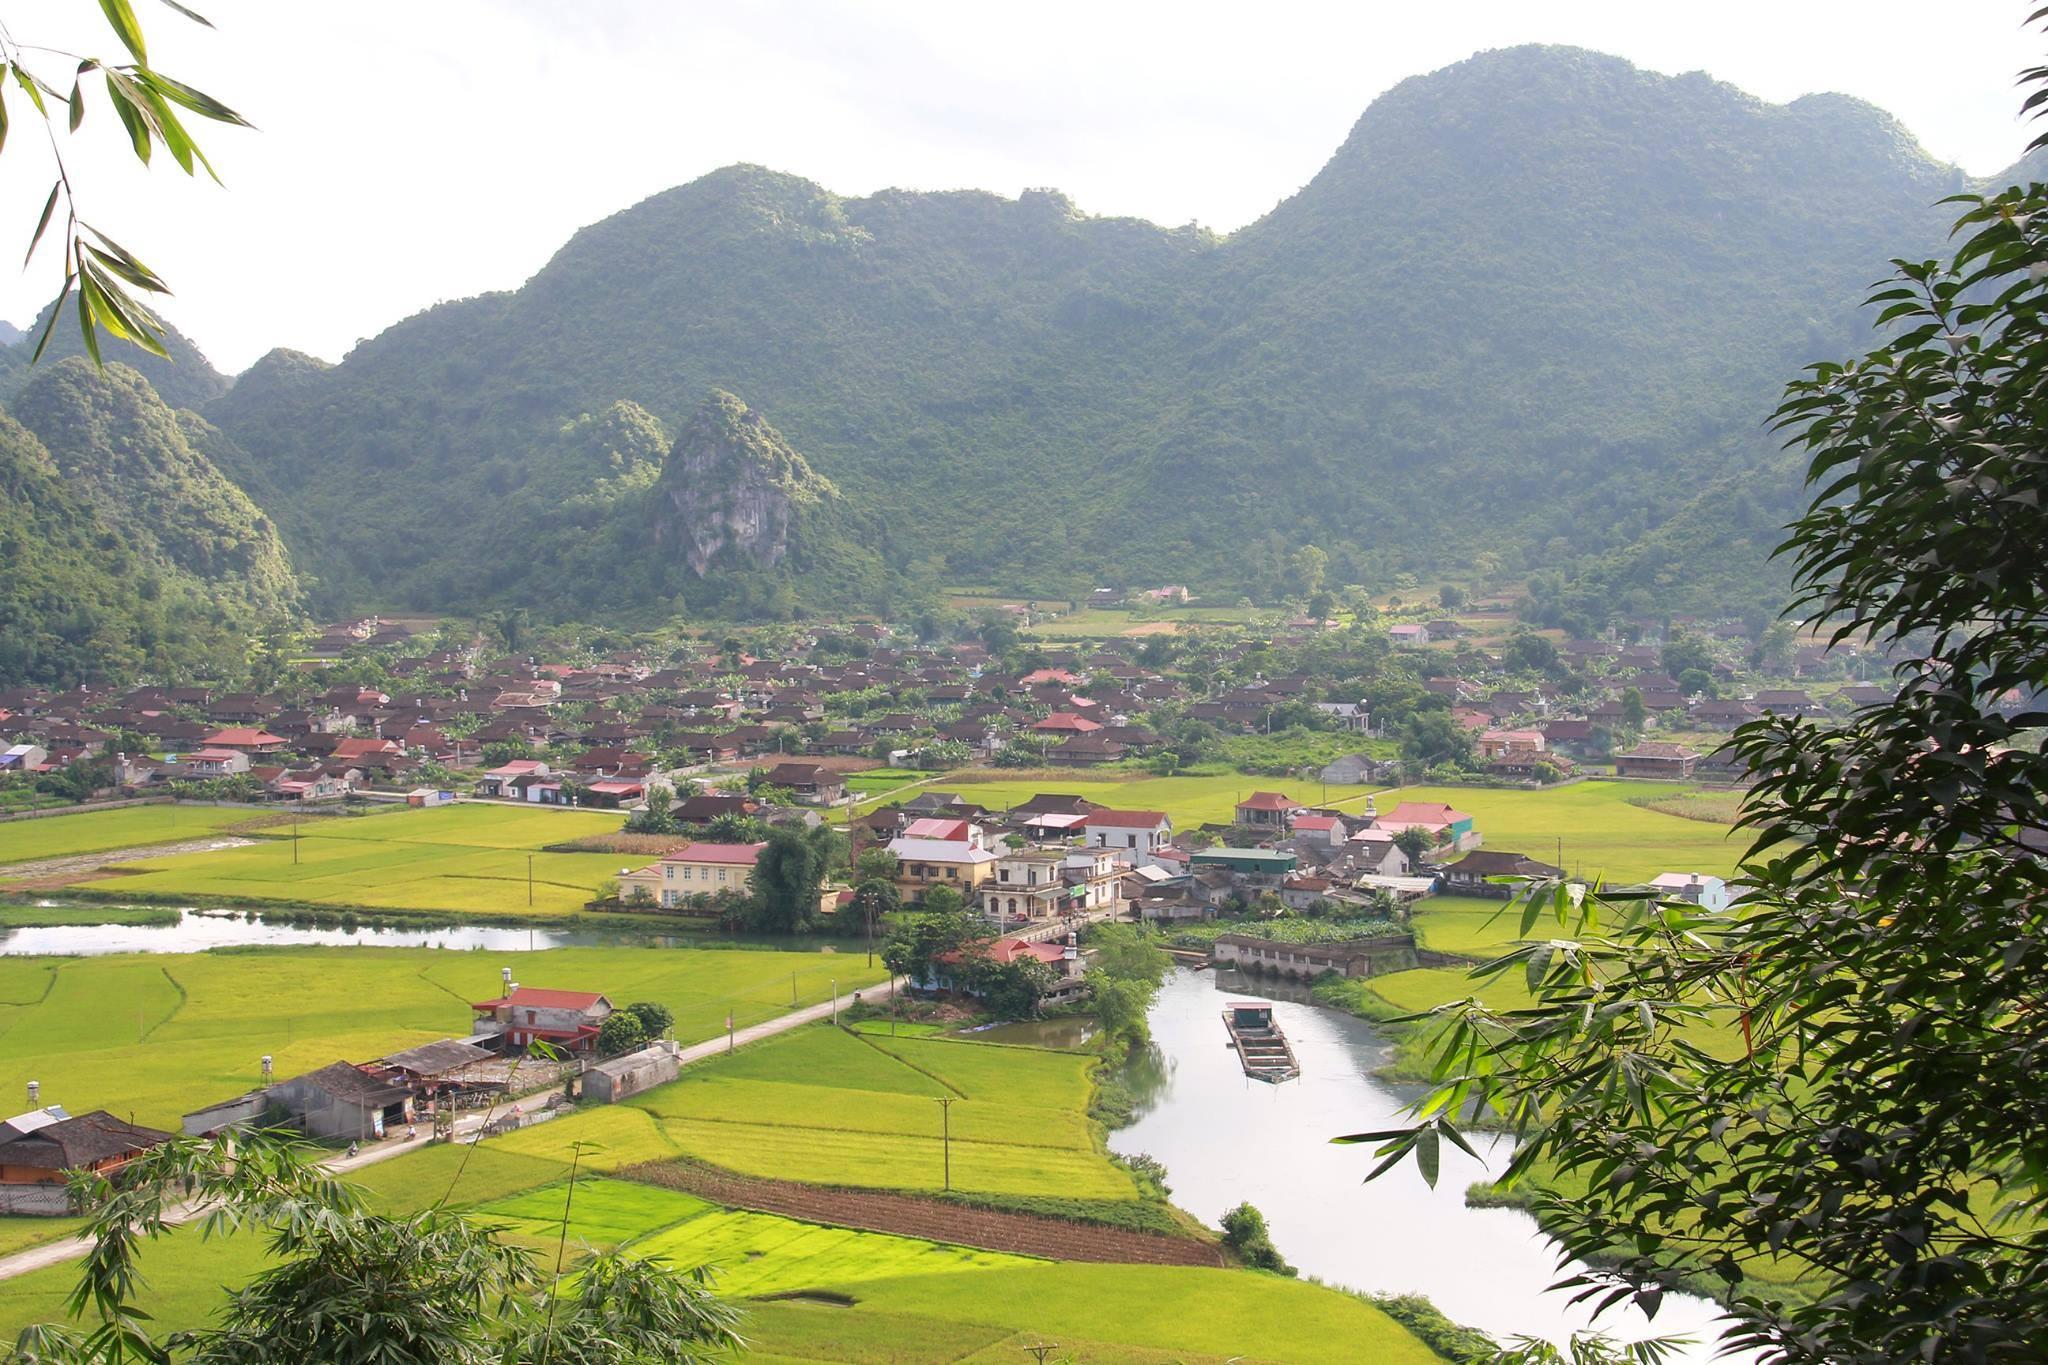 tour-bac-son-trecking-na-lay-mua-lua-chin-2-ngay-1-dem-du-lich-nui-viet-vietmountain-travel10